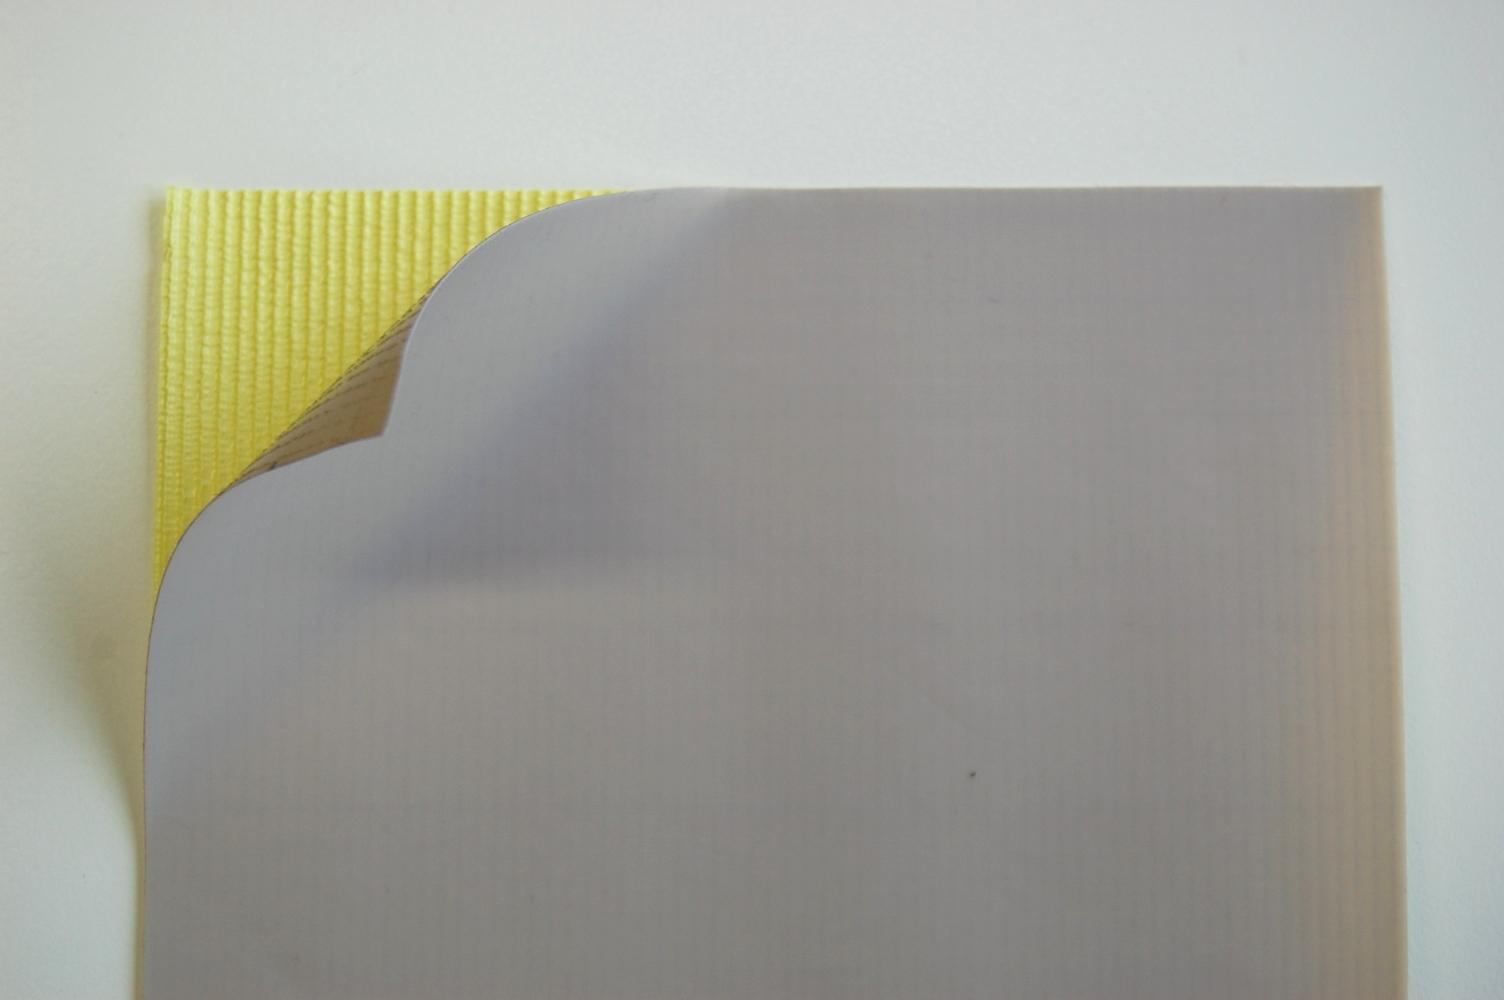 Ptfe virginale folie 0 25 mm einseitig selbstklebend for Folie selbstklebend